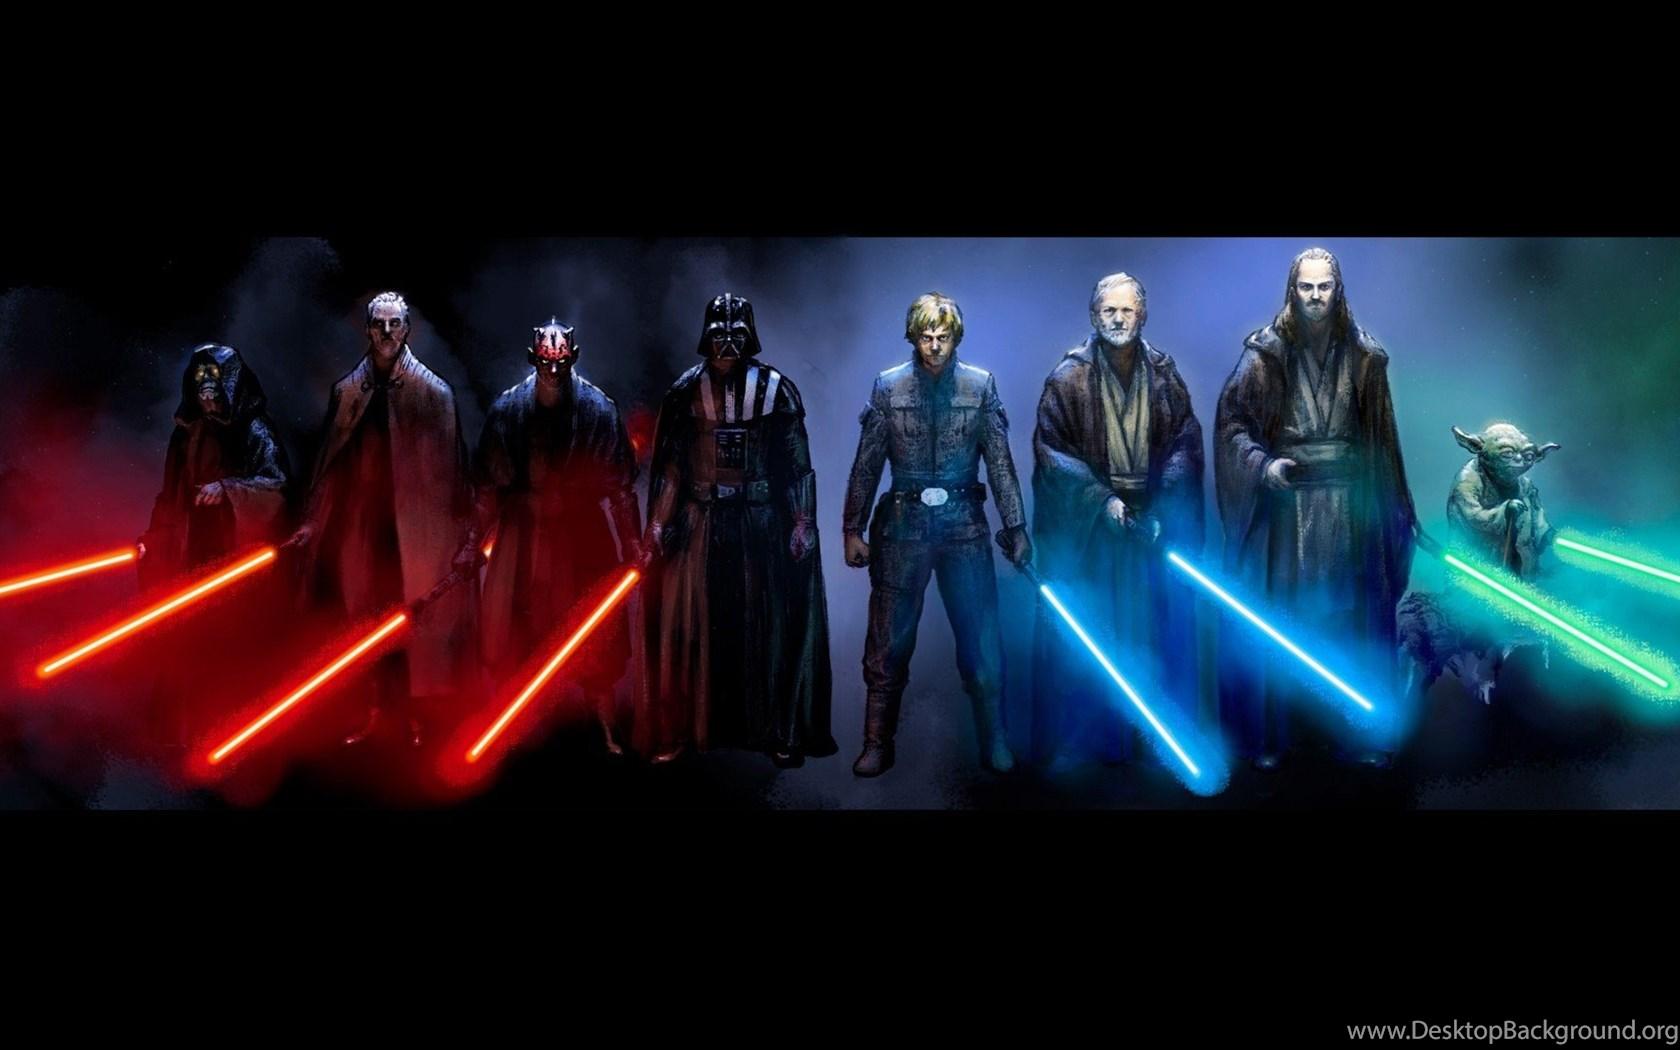 Anakin Skywalker Darth Vader Sith Jedi Fan Art Star Wars Hd